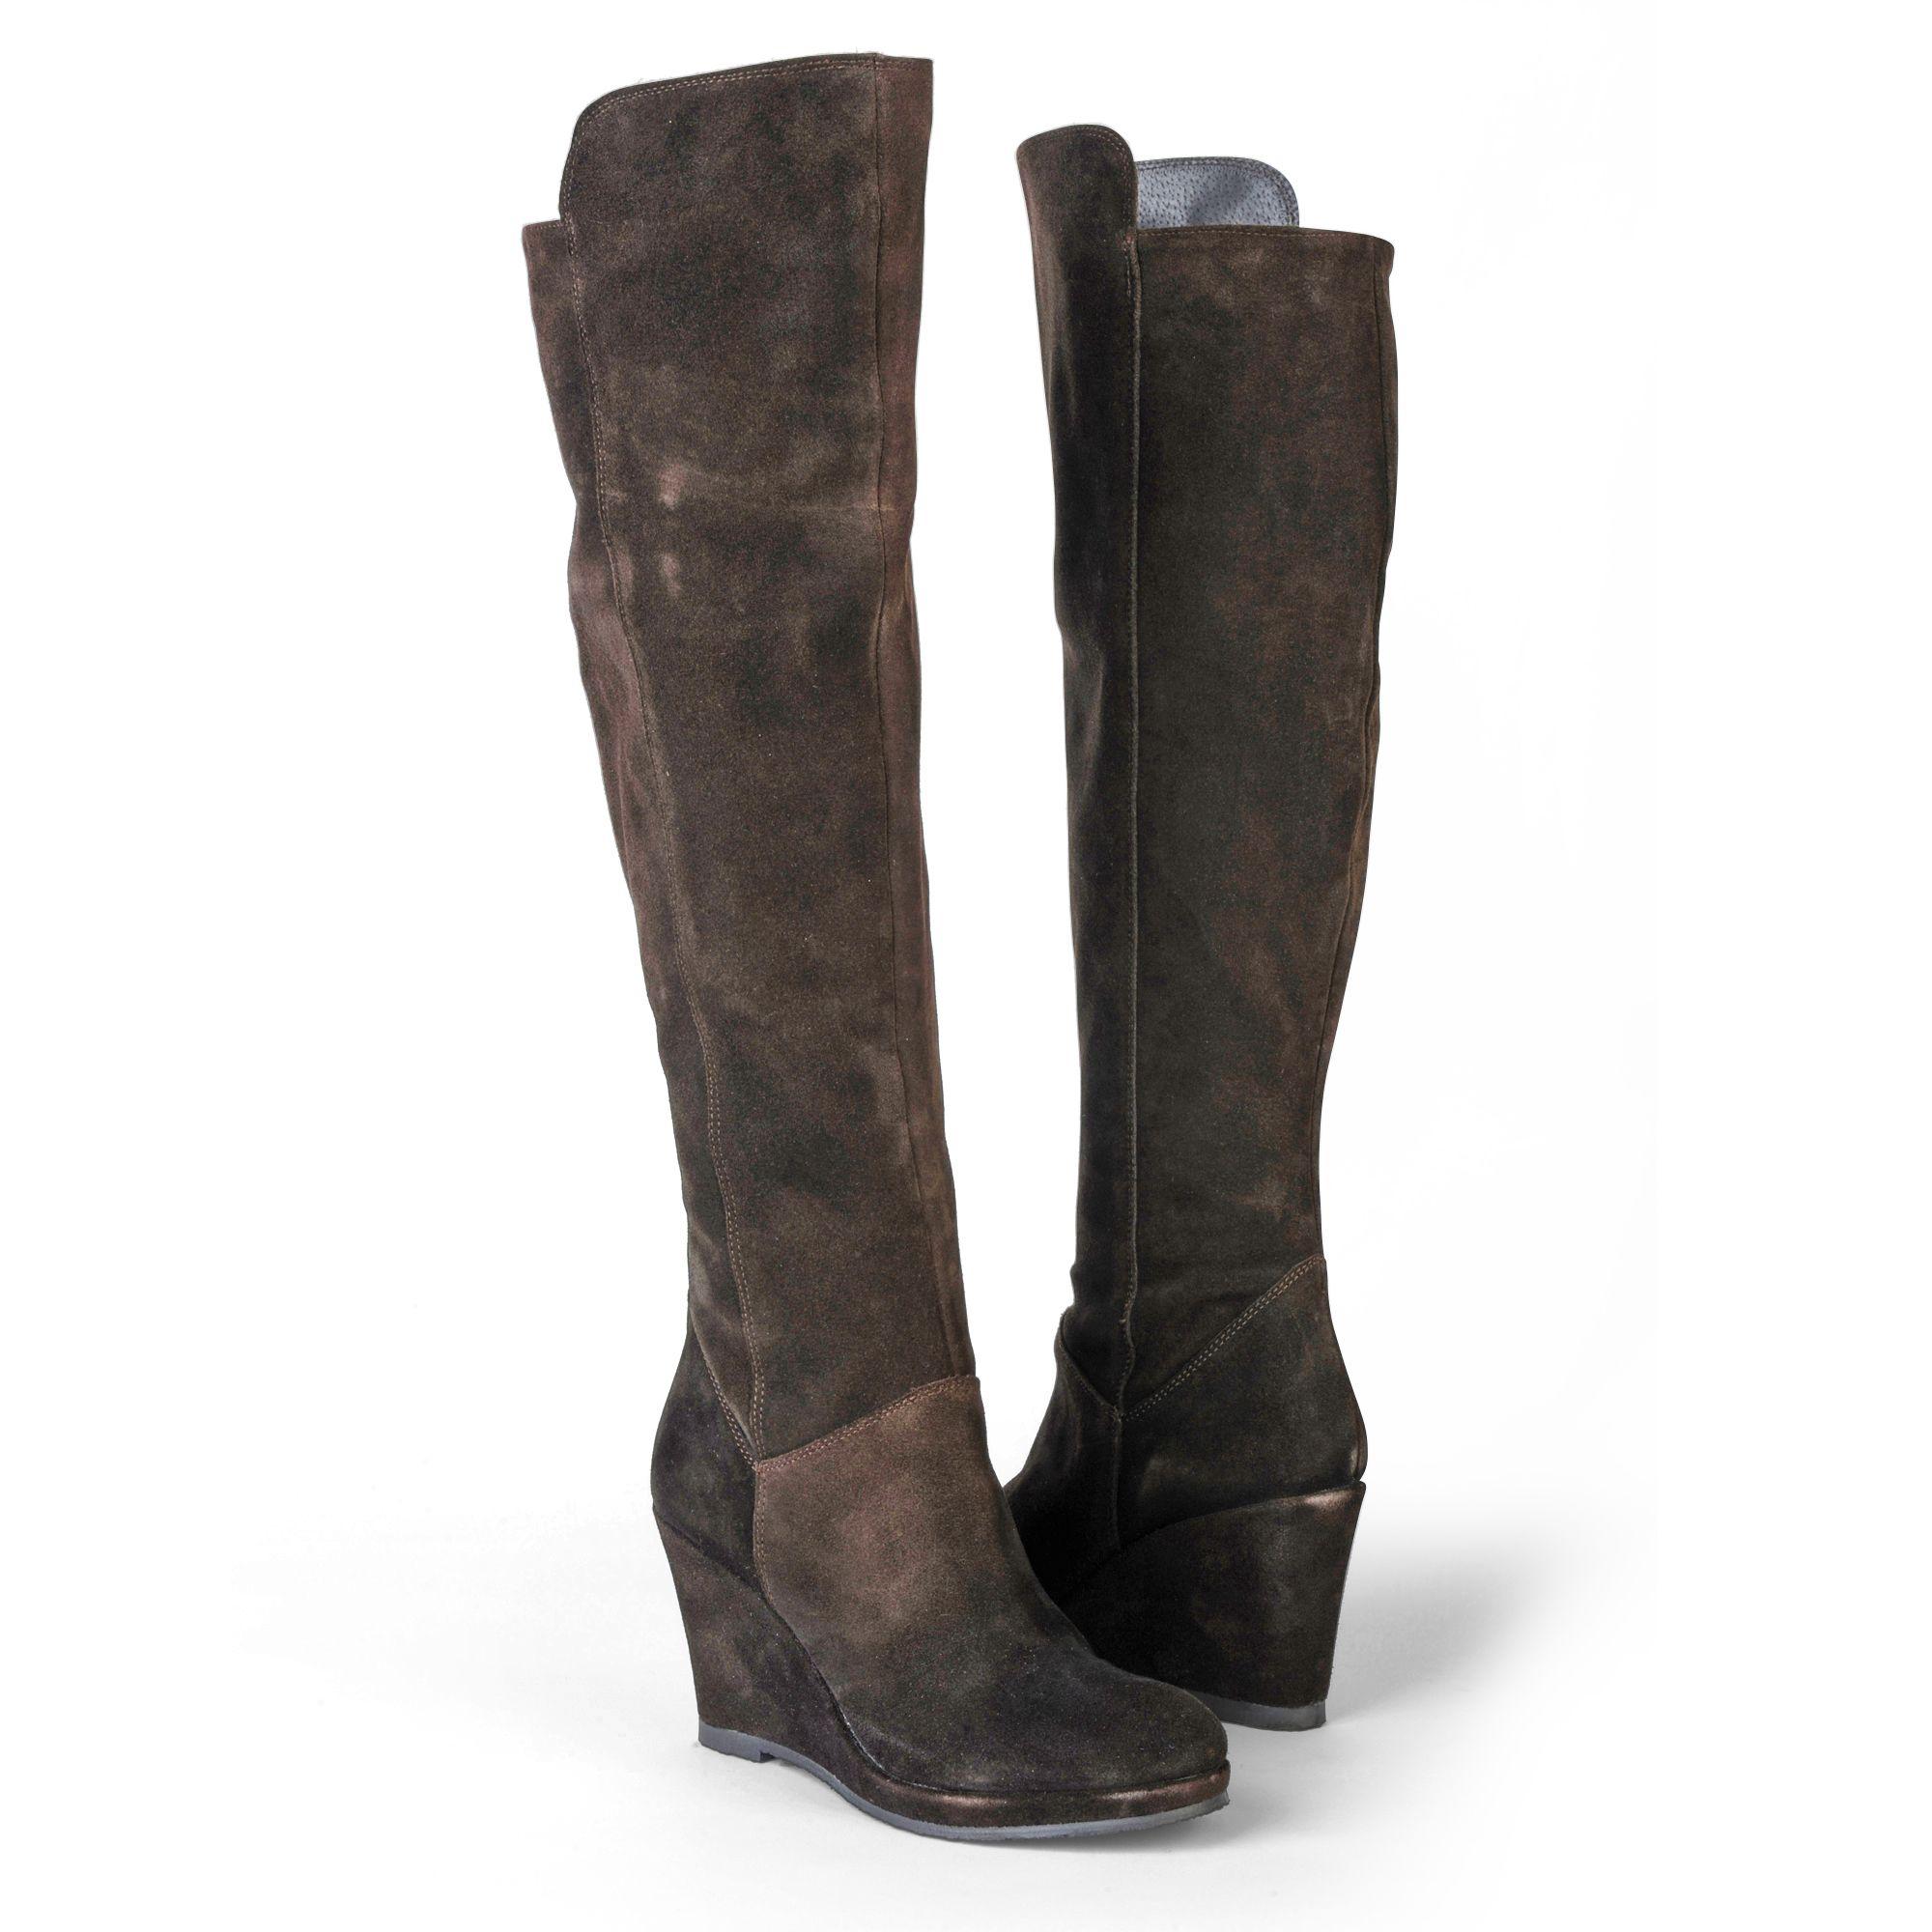 carvela kurt geiger wolfe brown knee high boots in brown